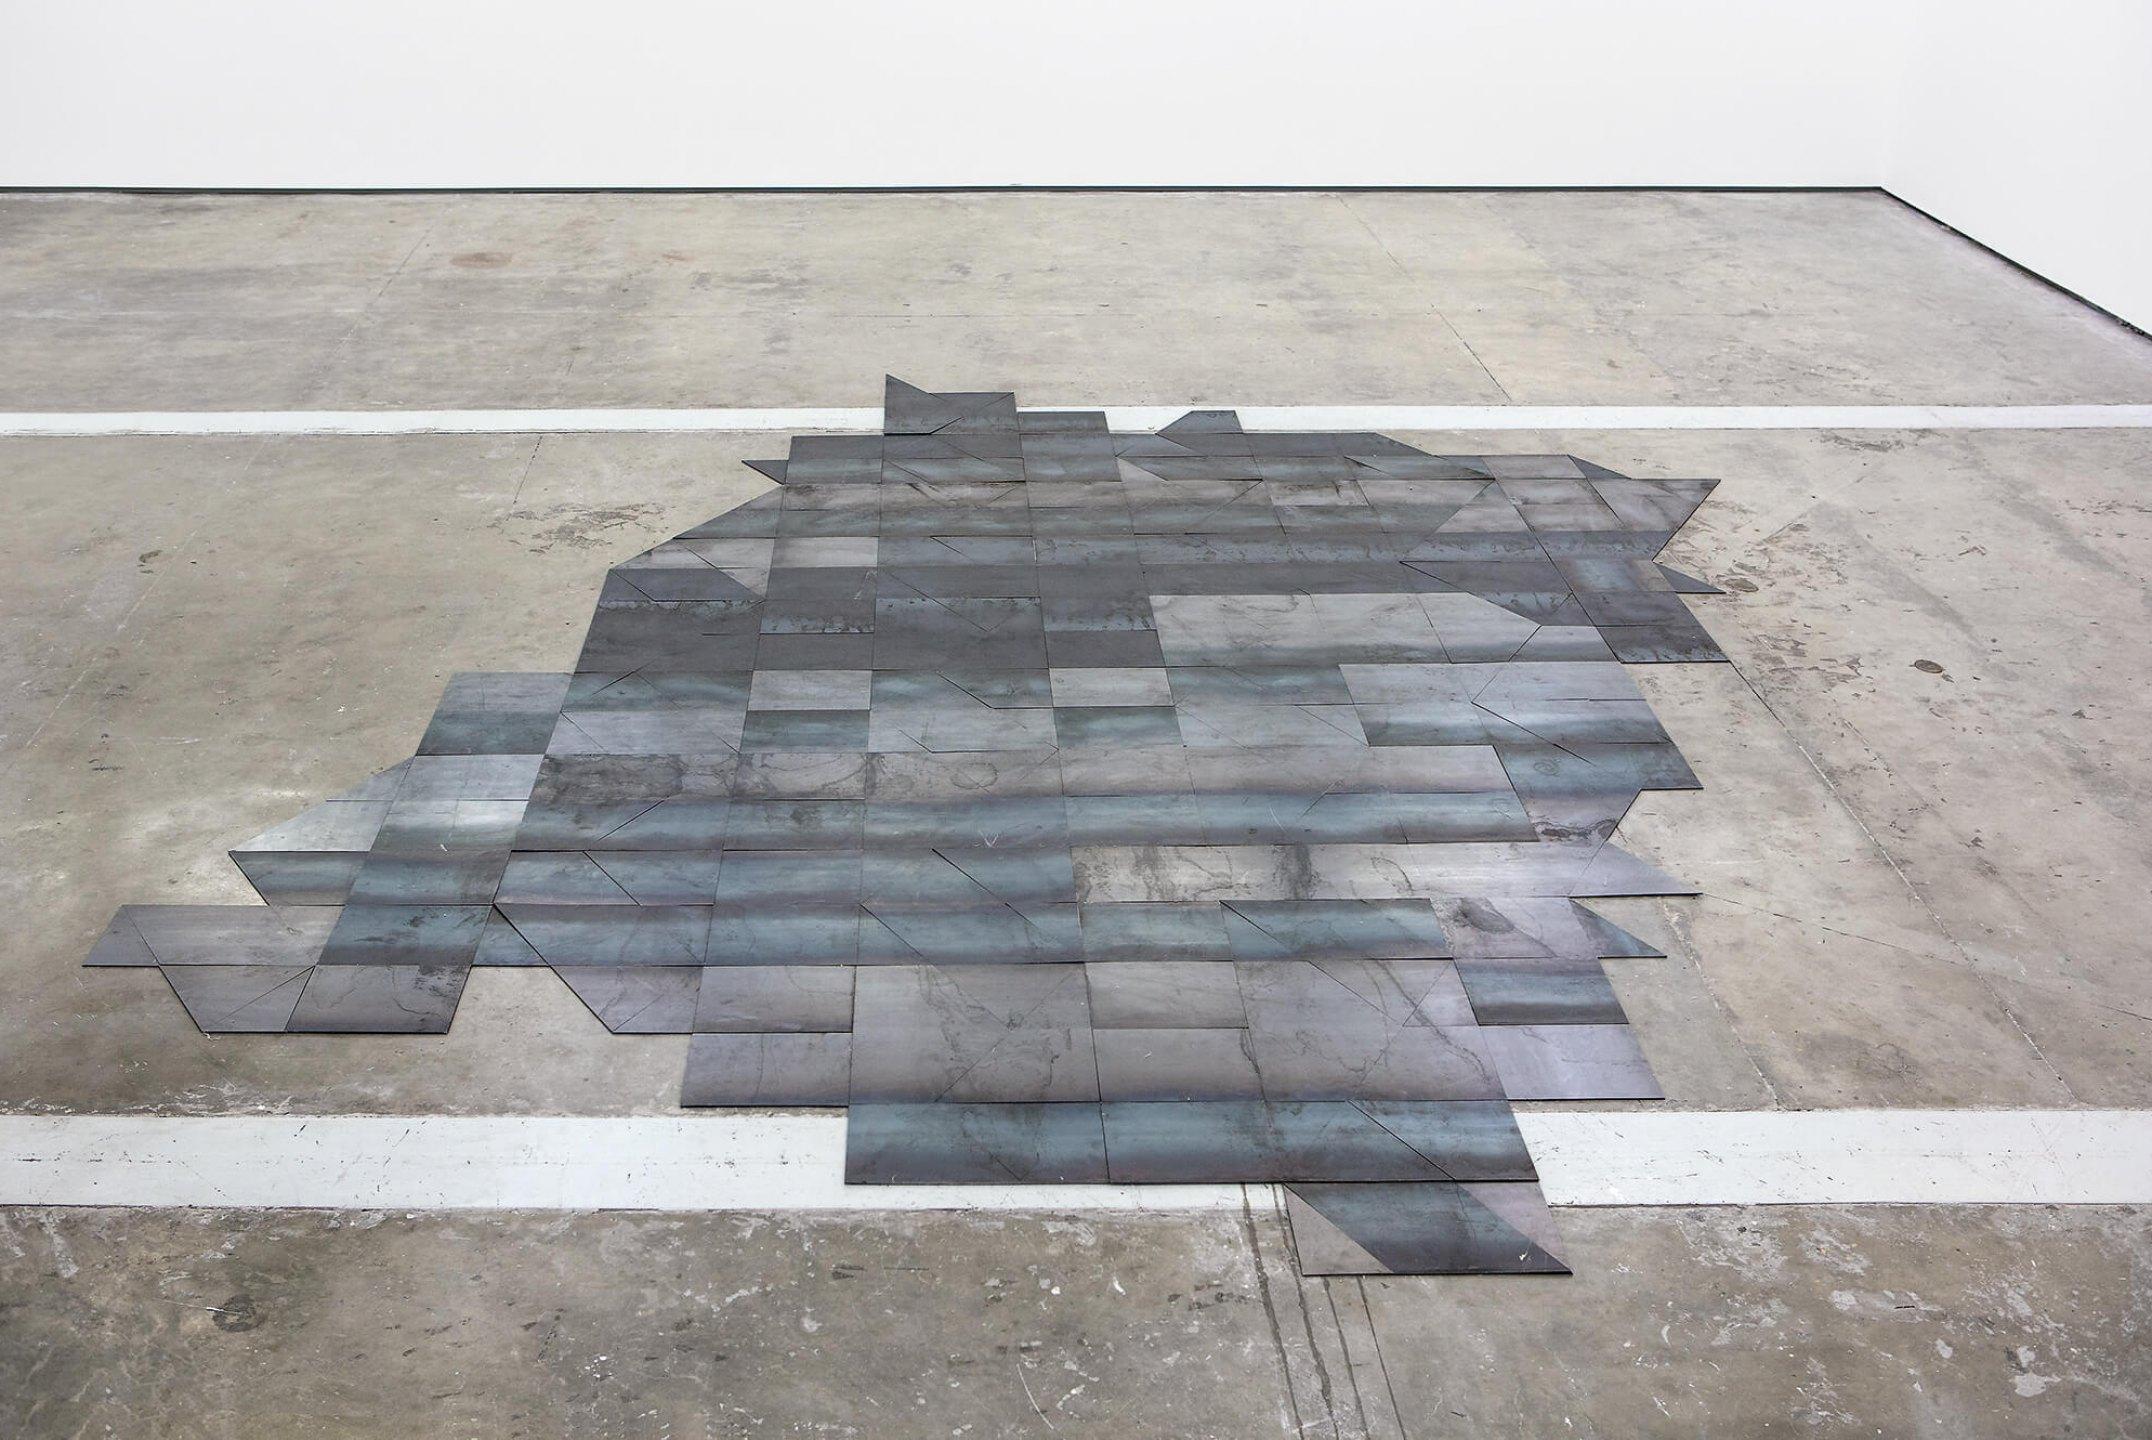 Daniel Steegmann Mangrané, <em>Systemic Grid I,</em> 2014, laser cut steel, 550&nbsp;×&nbsp;502 × 0,5 cm - Mendes Wood DM